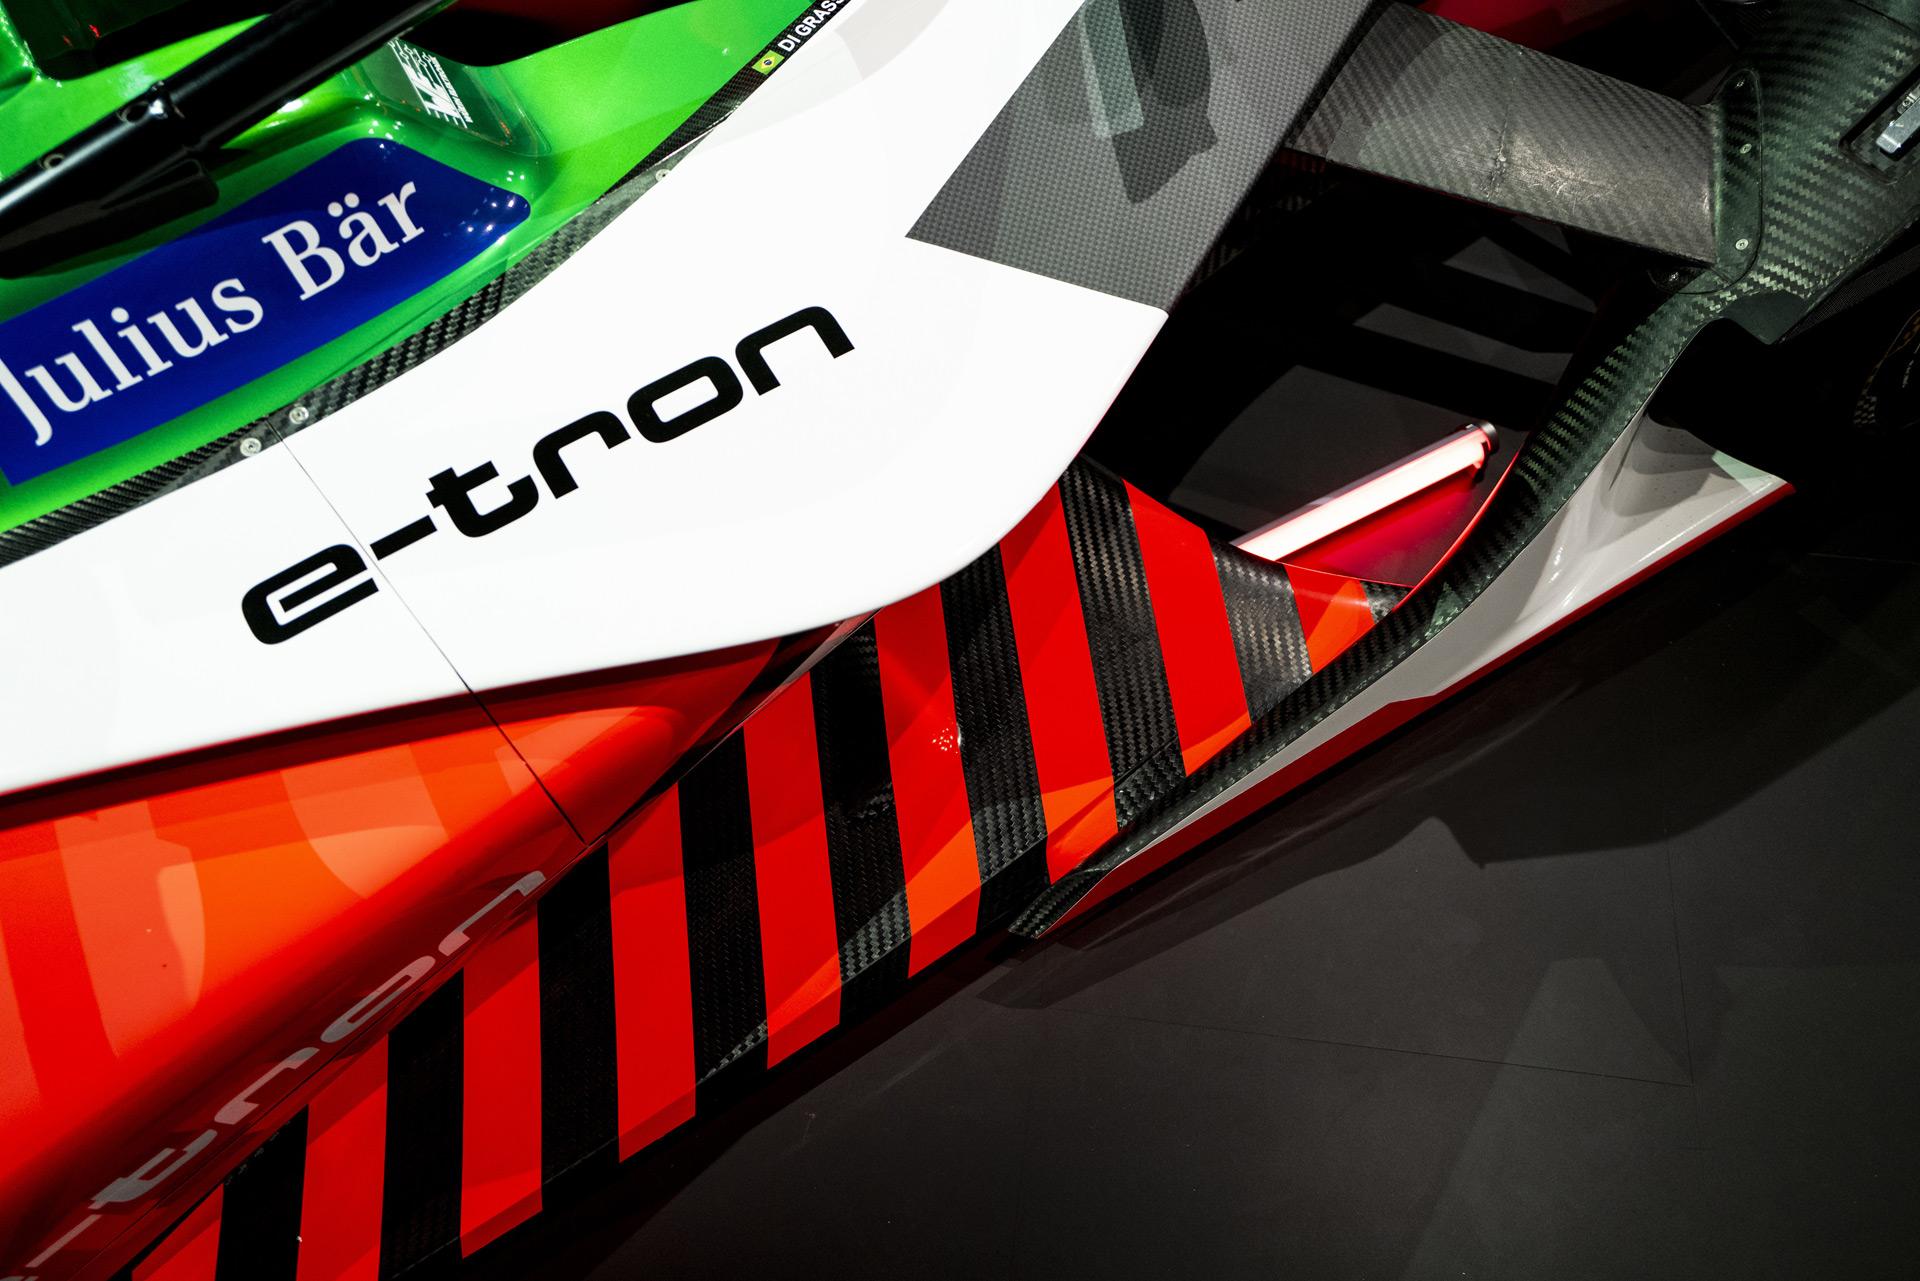 GM-Nikola deal, Mach-E GT Performance, Best Car To Buy 2021 shortlist: Today's Car News